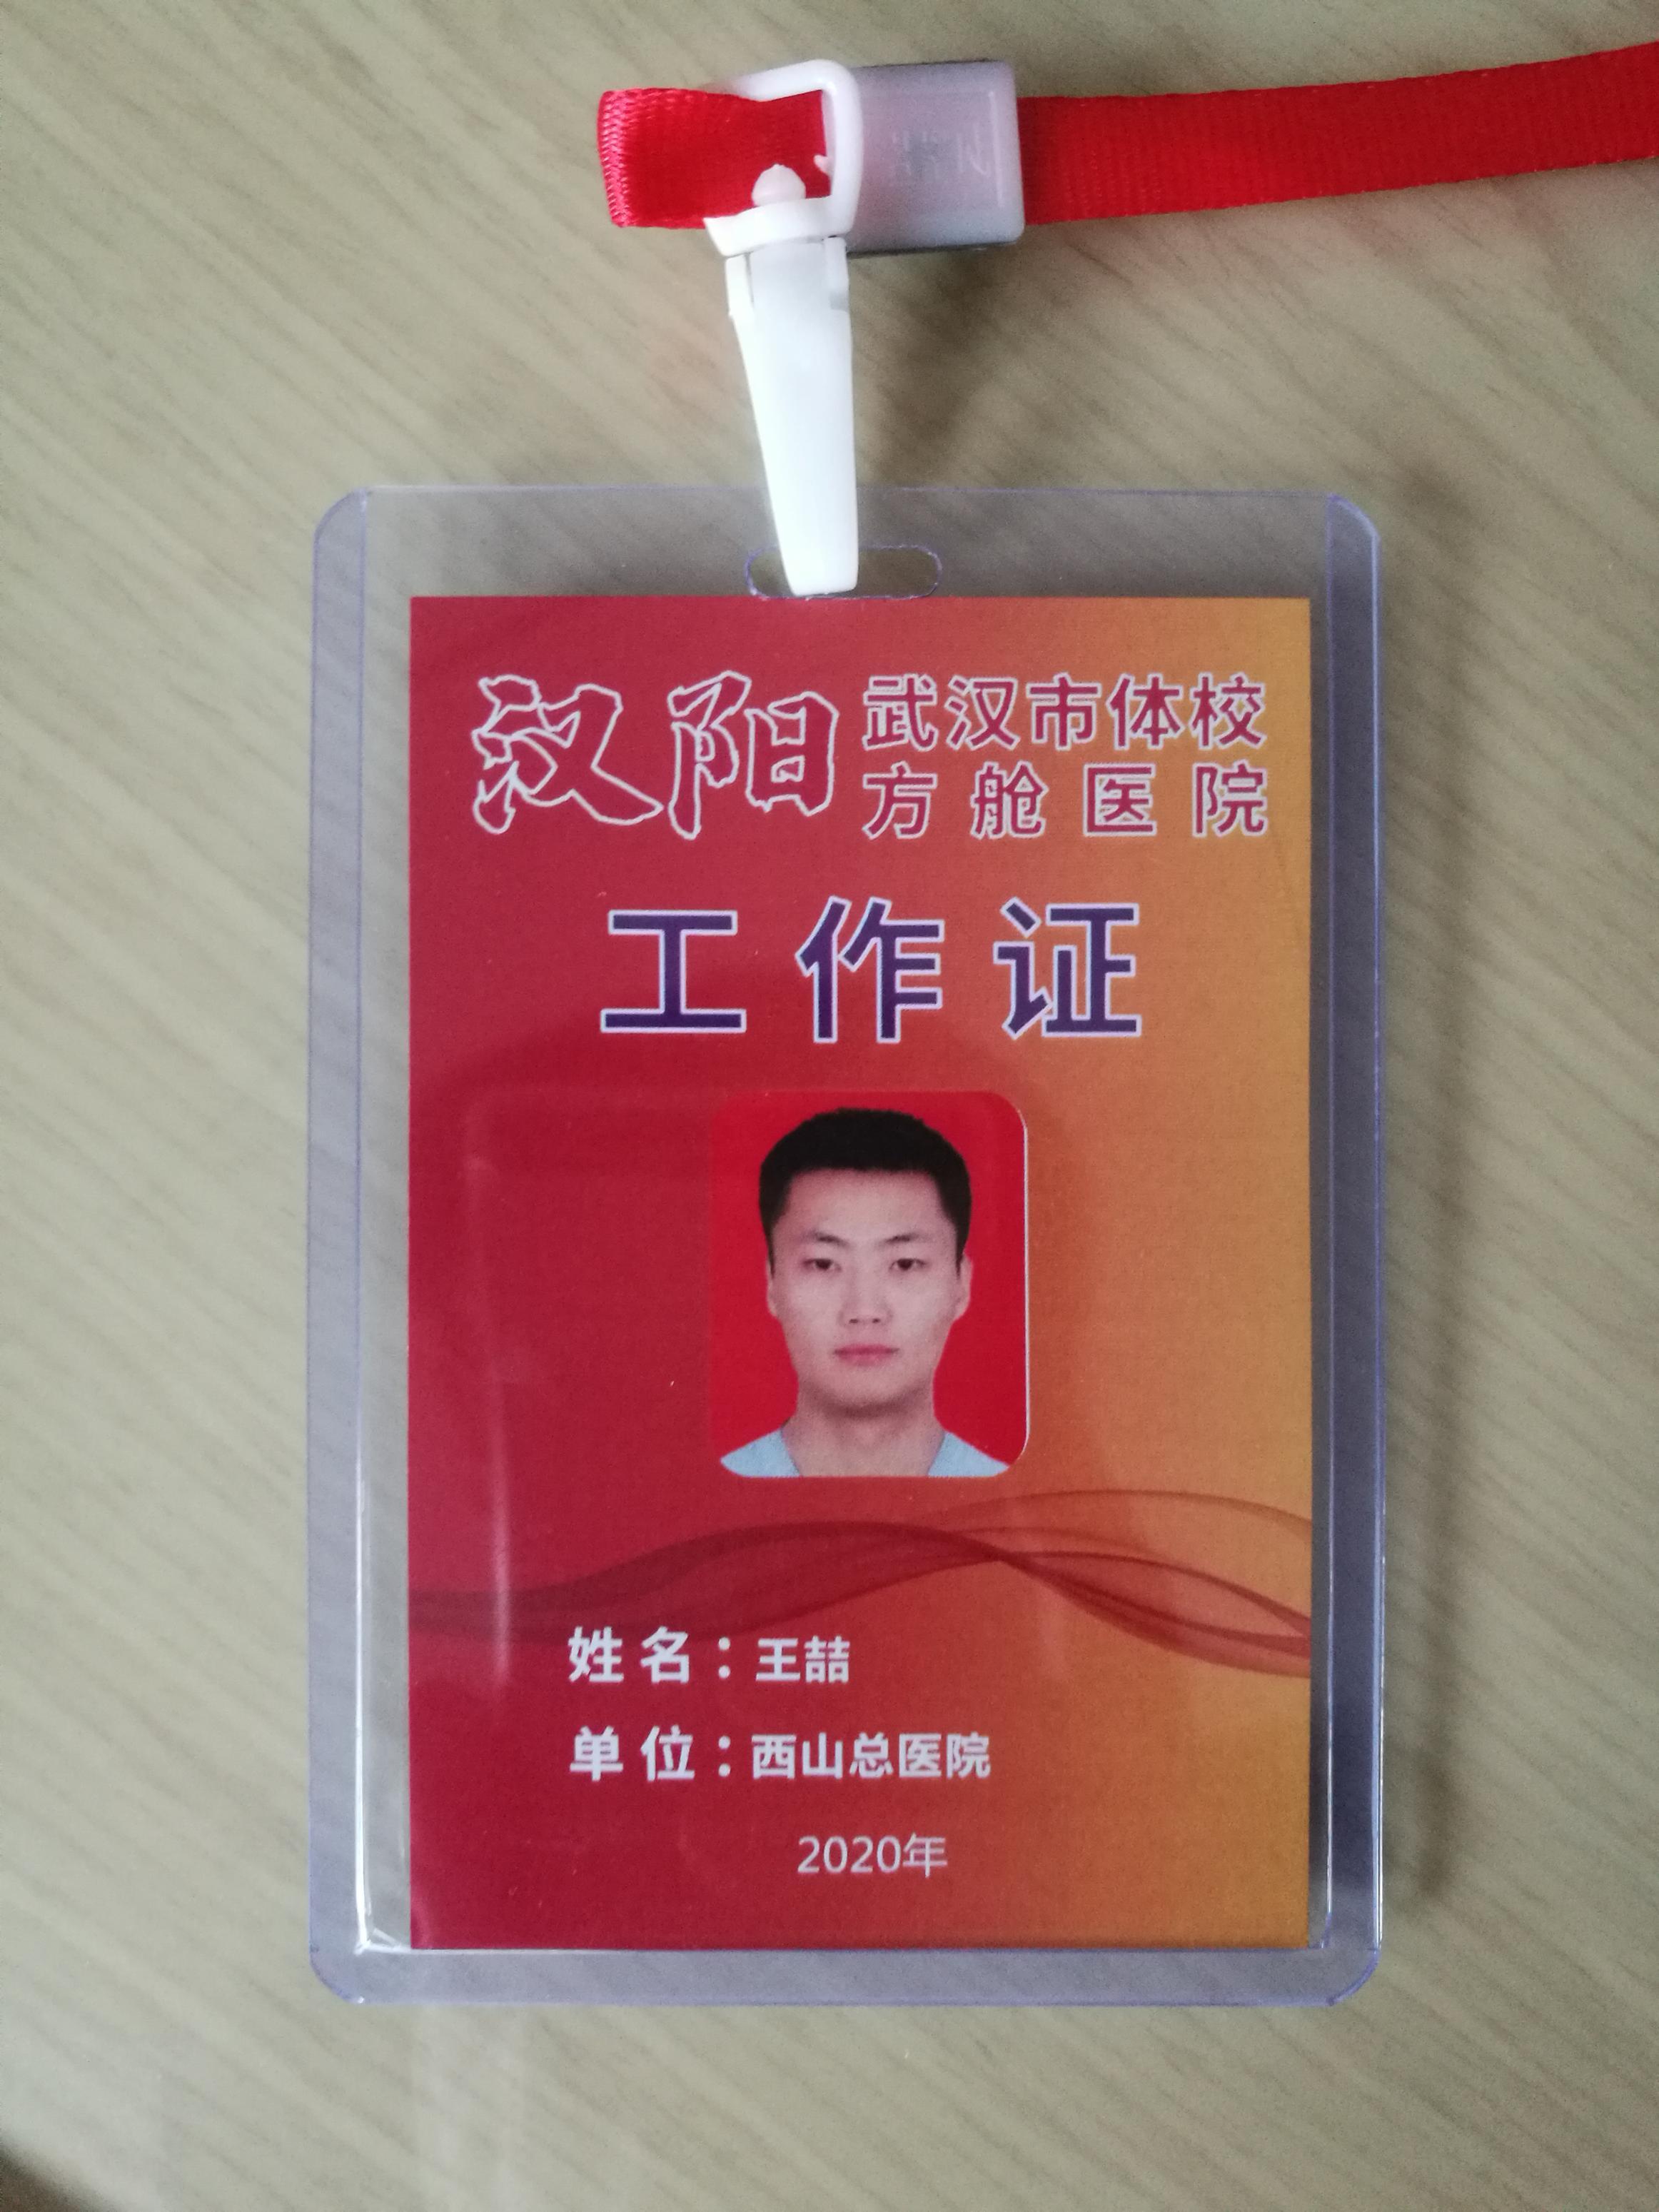 C:\Users\wansan\Desktop\西山总医院王喆\20.jpg